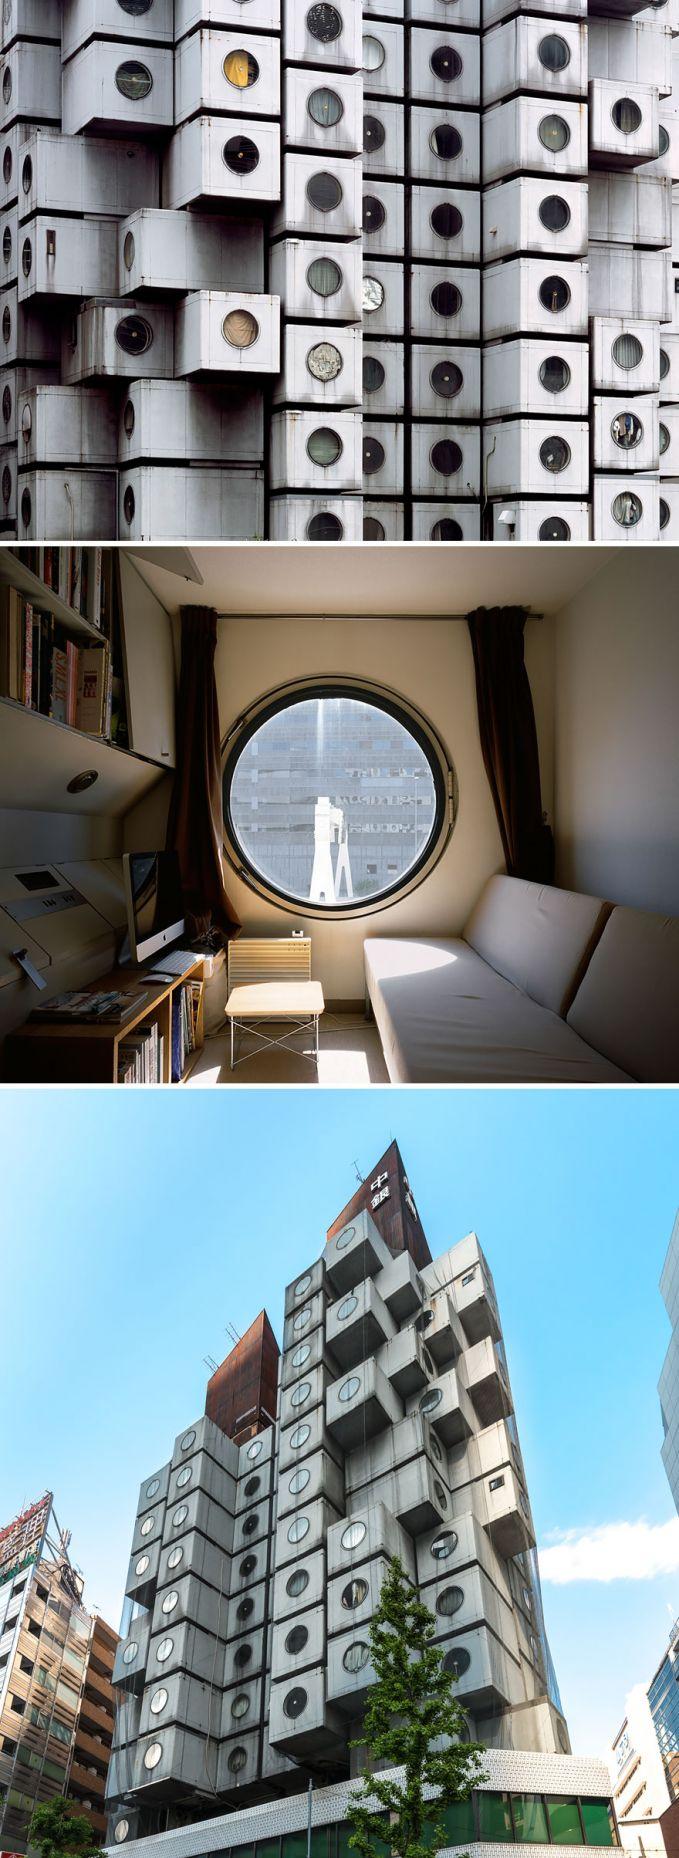 Menara Kapsul Nakagin, Tokyo, Jepang Selain kaya kapsul, mirip mesin cuci juga ya Pulsker? Hehehe, tapi jangan salah, kecil-kecil begitu dalemnya bikin nyaman banget.